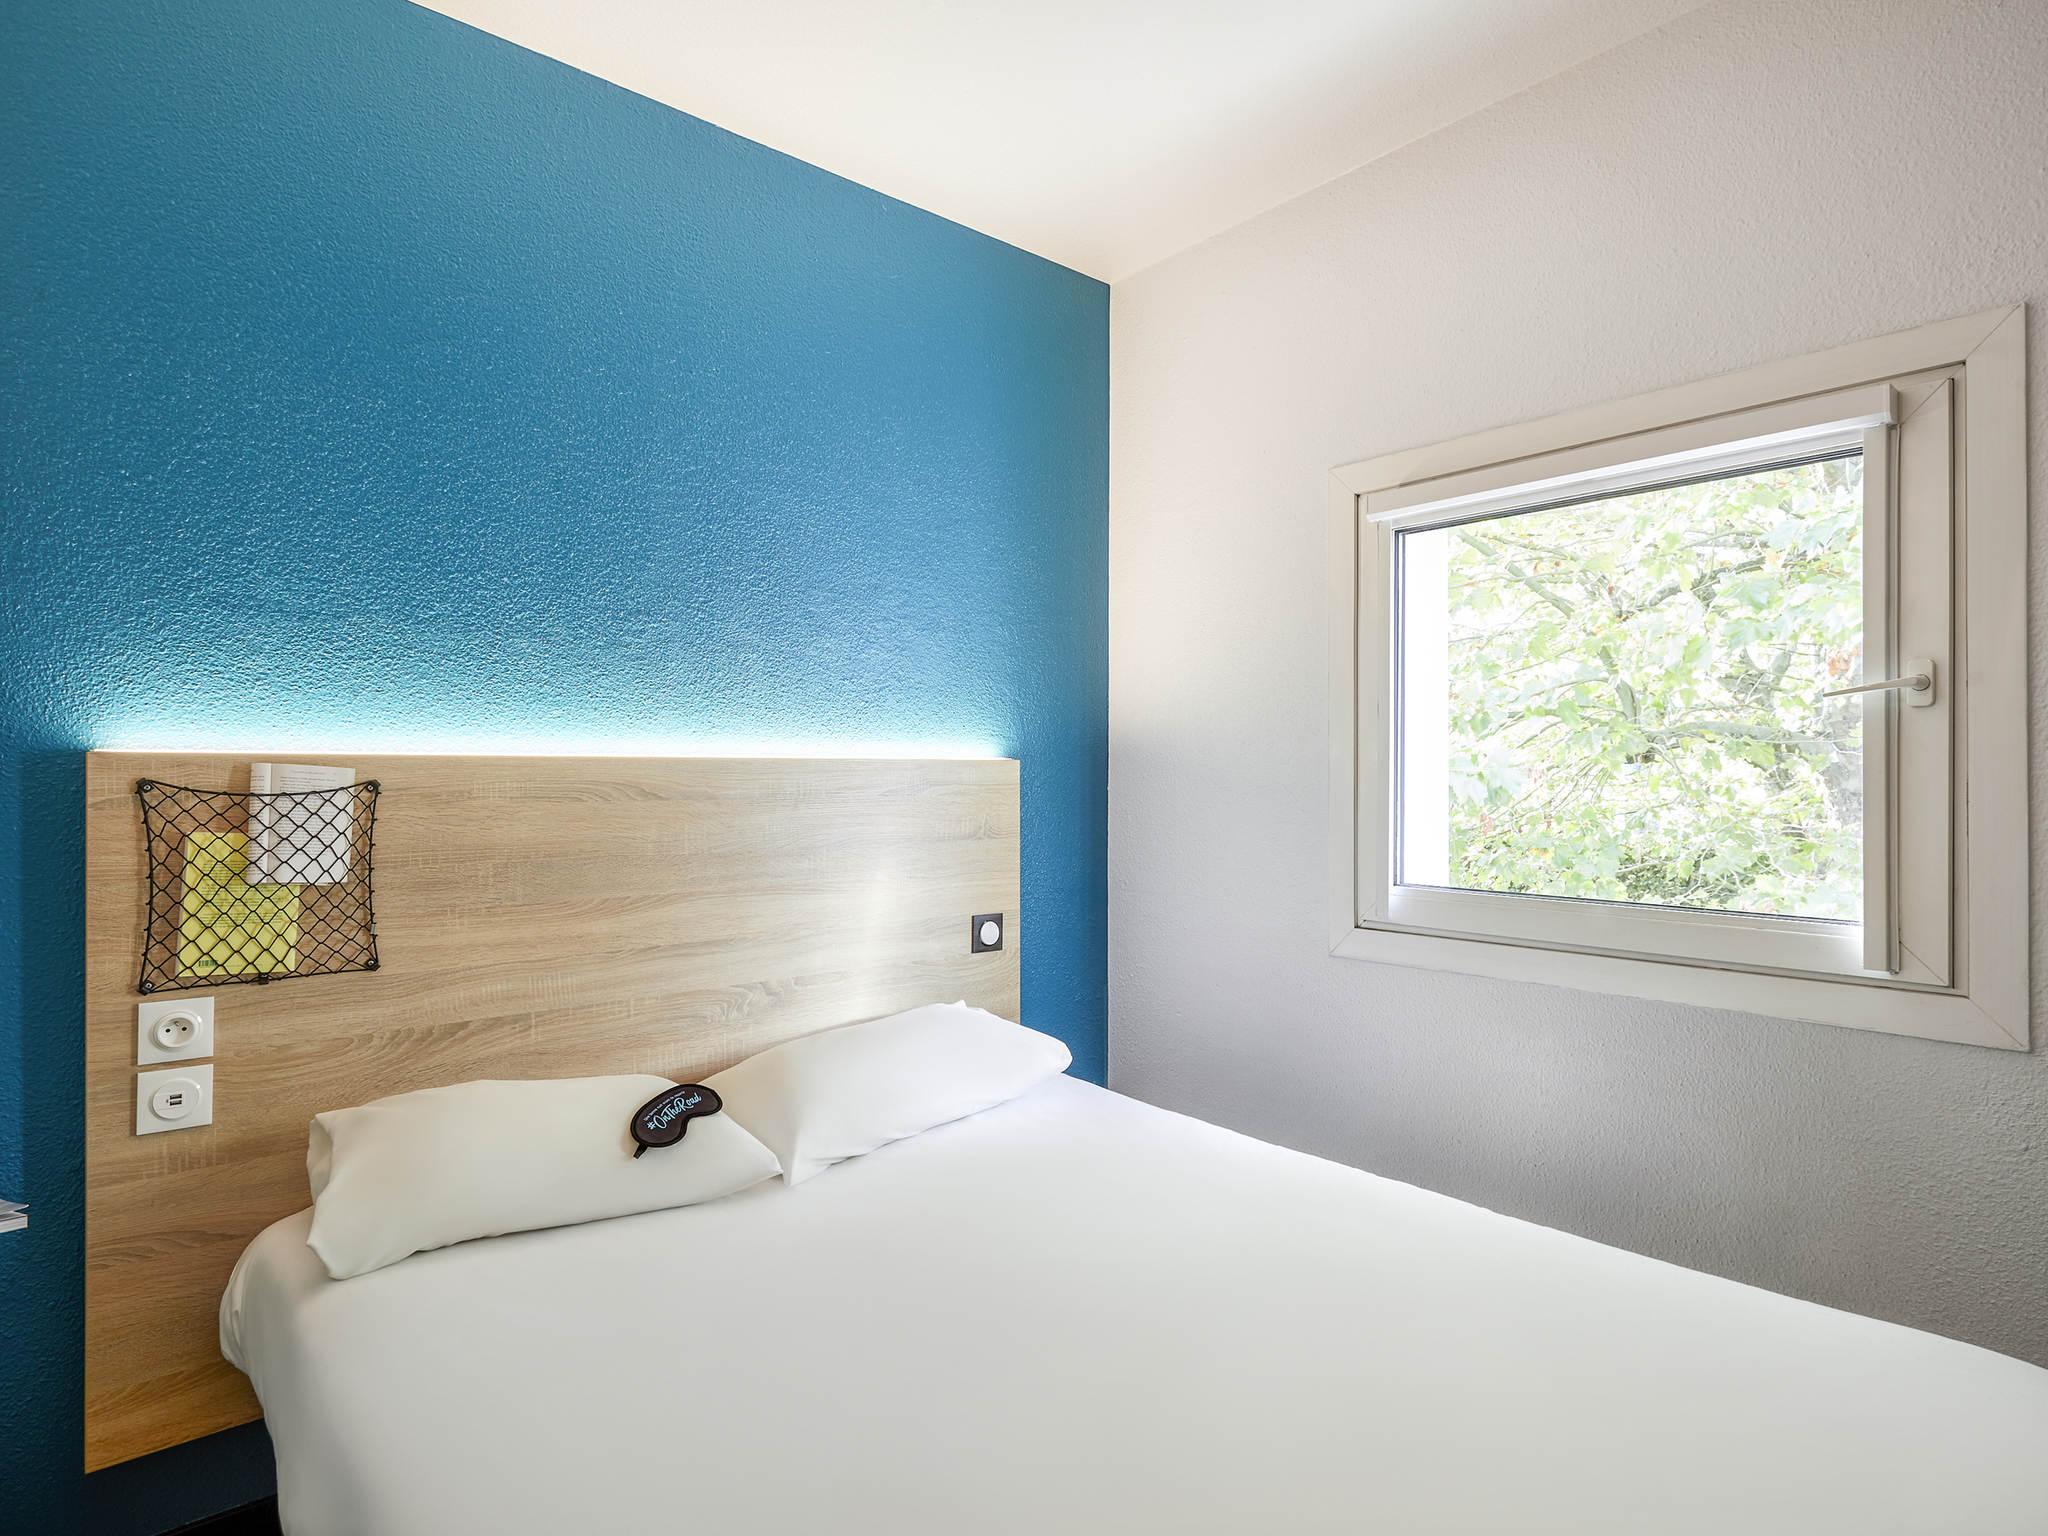 Hotel – hotelF1 Lyon Saint-Priest (rénové)